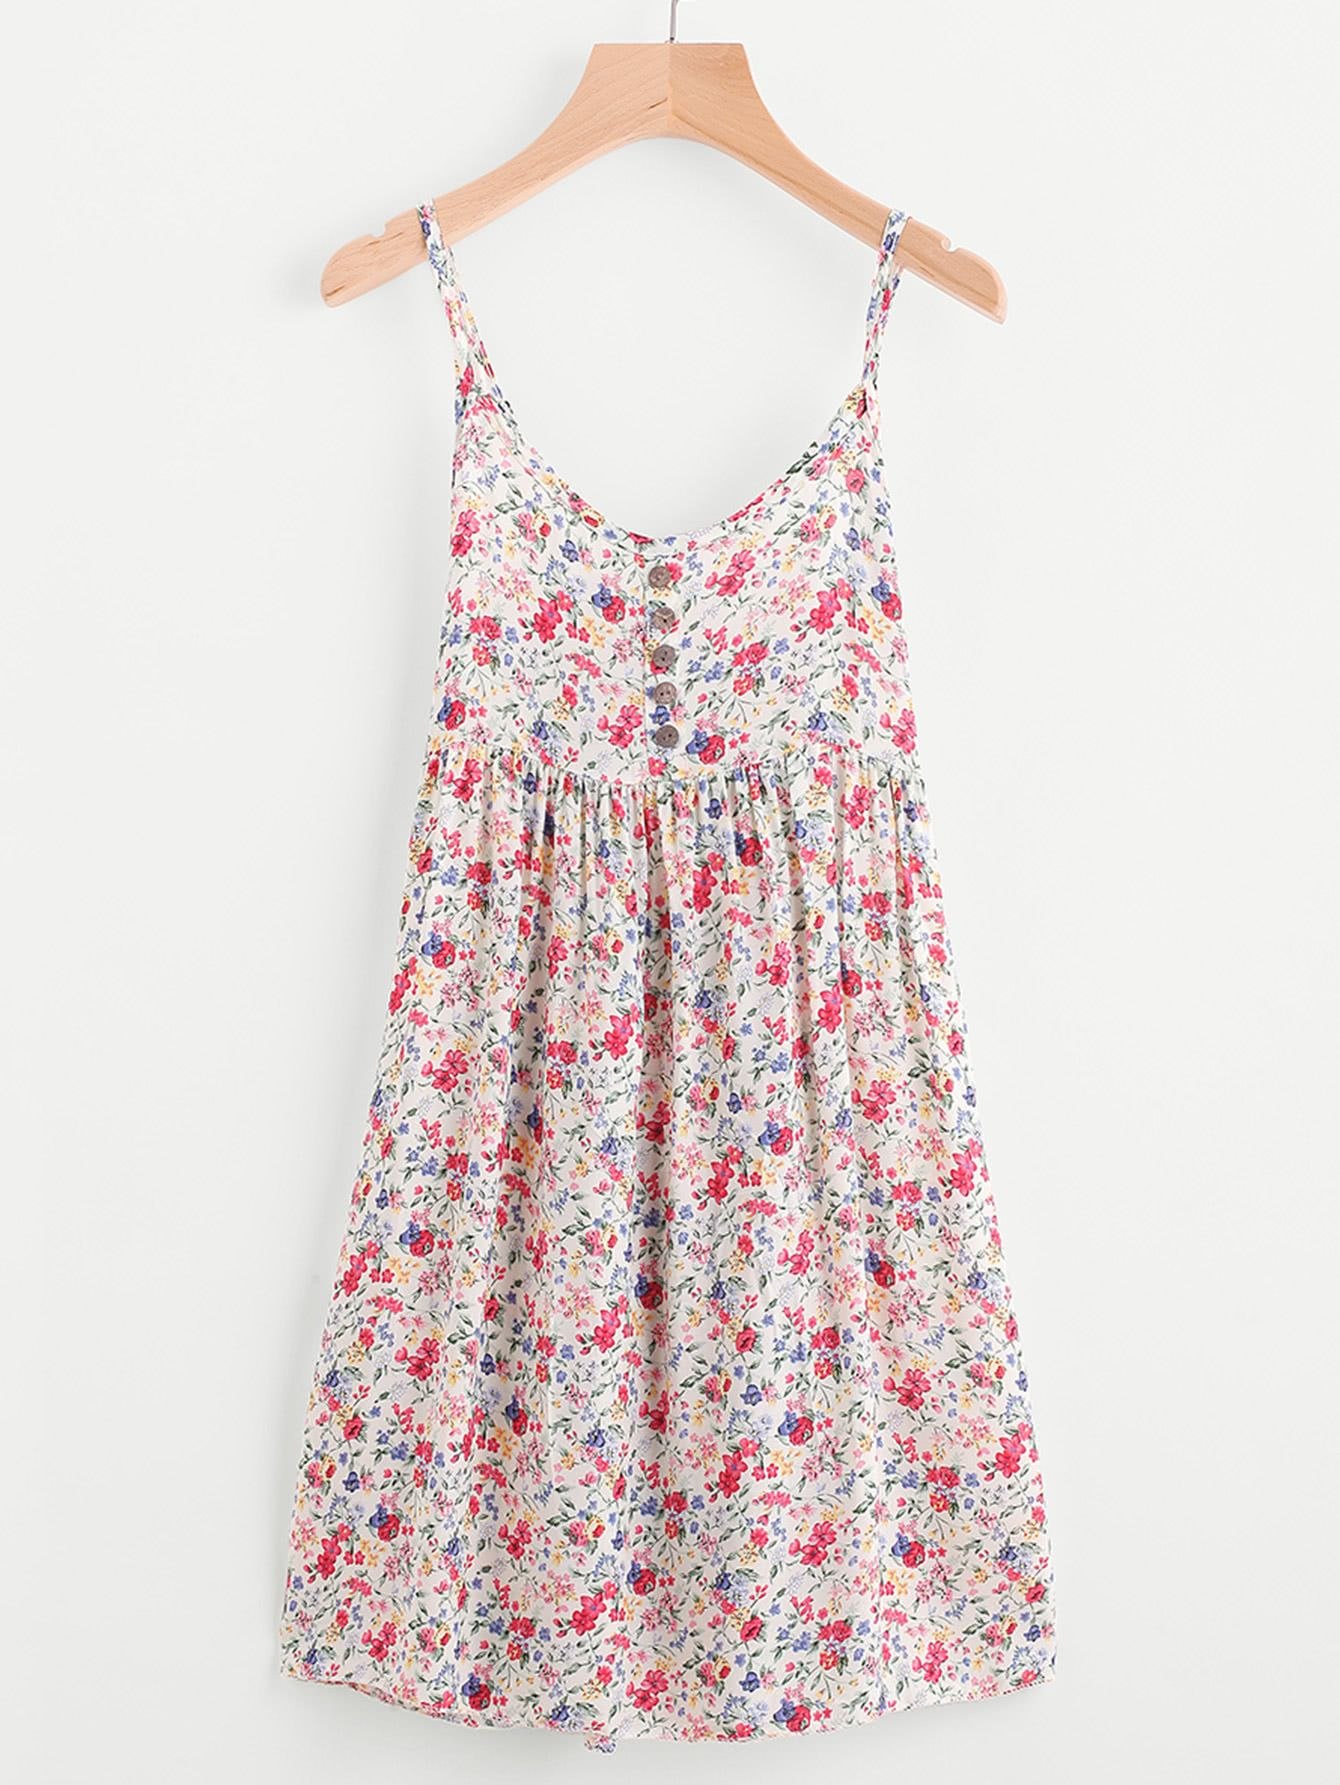 a5a0858267f41 Shop Ditsy Print Random Single Breasted Cami Dress online. SheIn offers  Ditsy Print Random Single